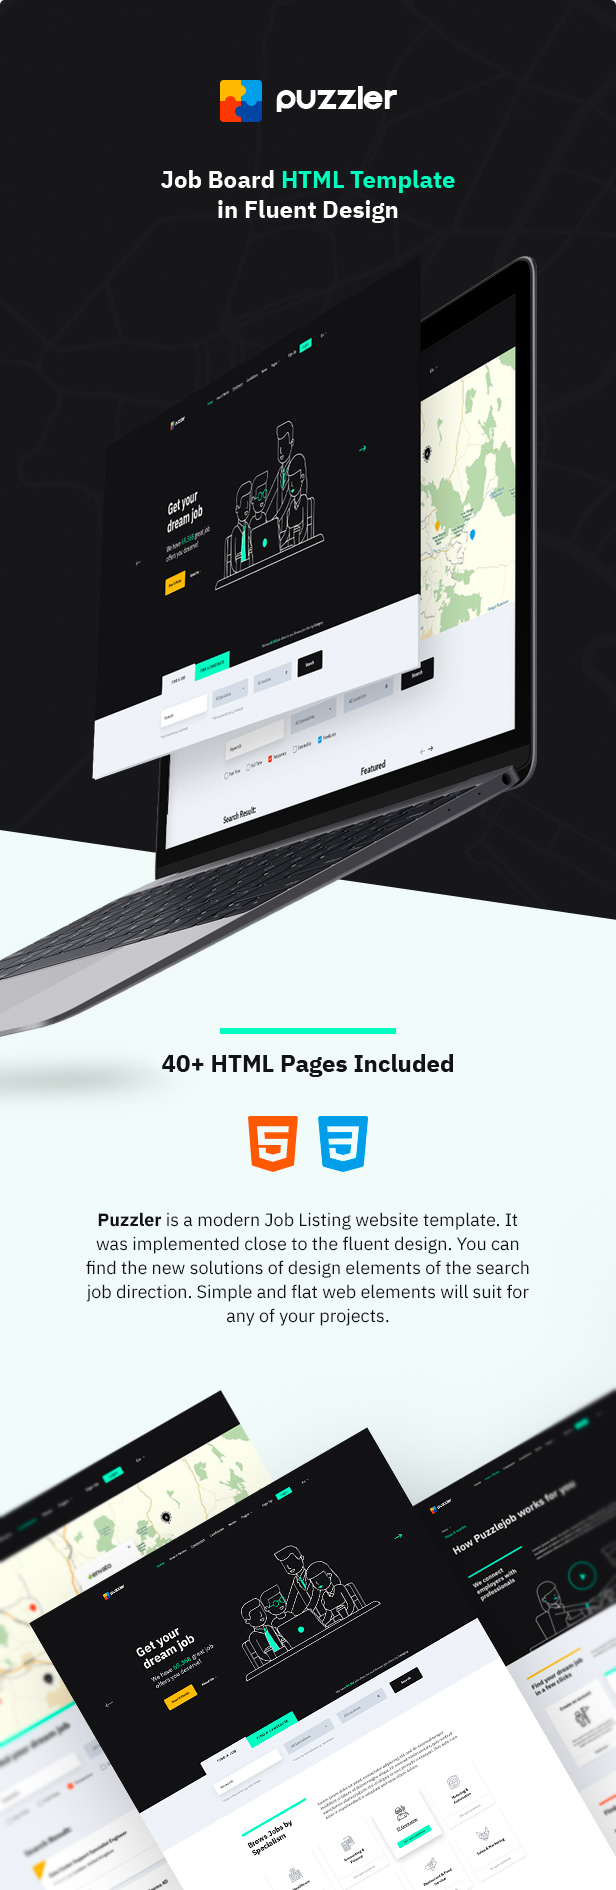 Job Board HTML Template in Fluent Design